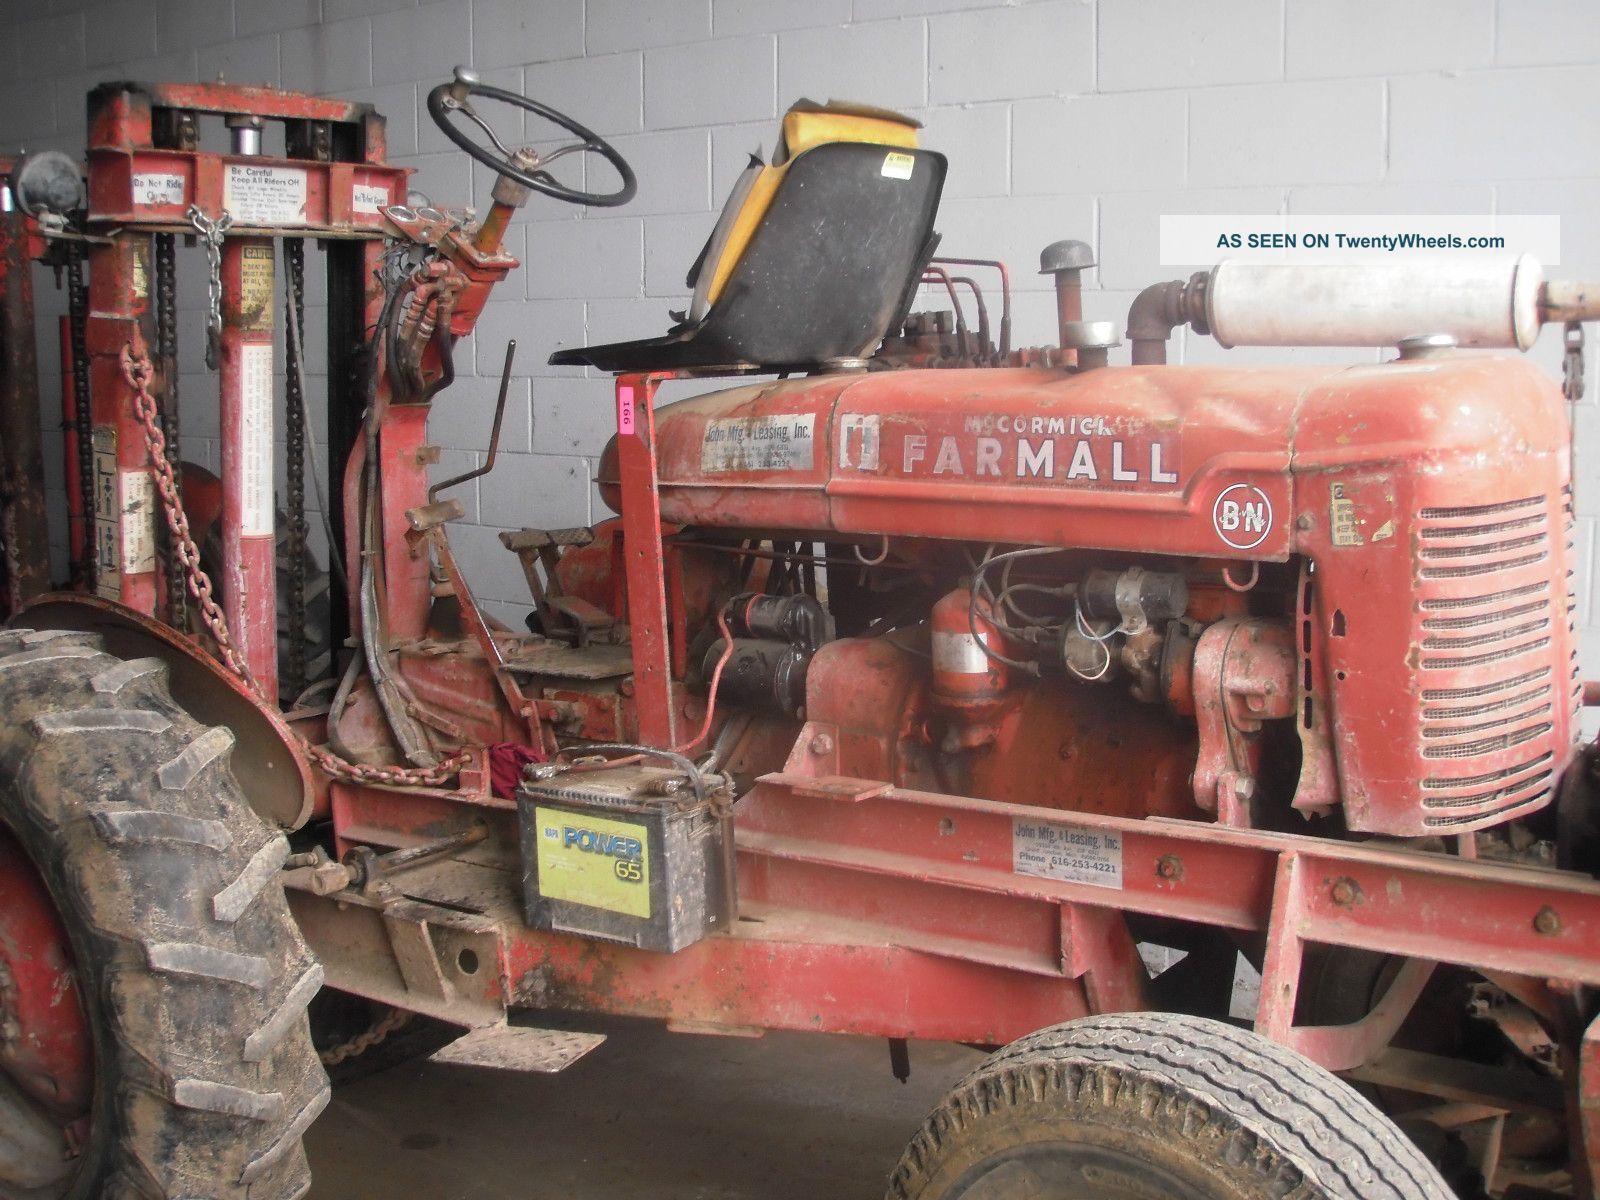 Bn International Mccormick Farmall Tractor Forklift All Terrain Tractors photo